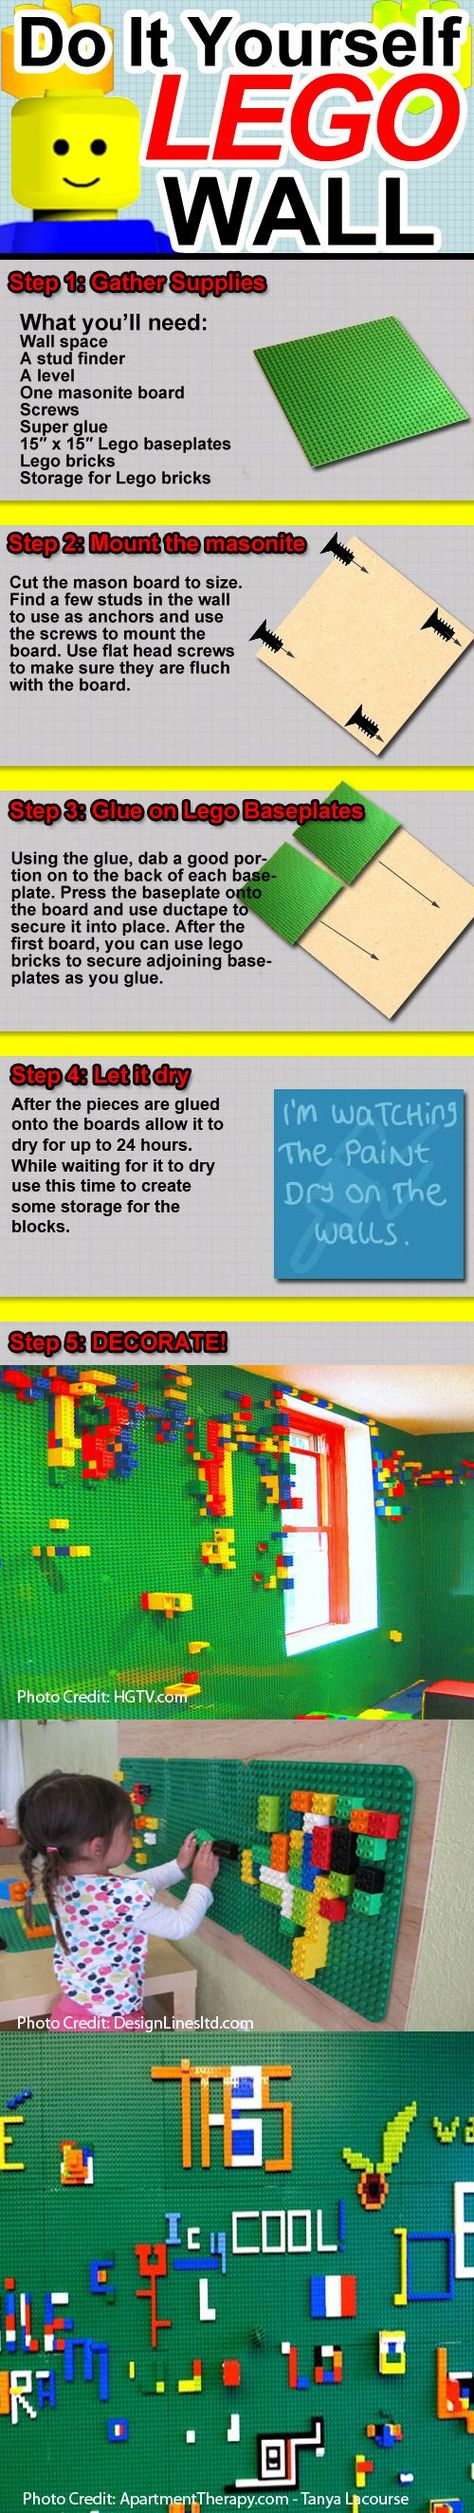 Definitely an awesome idea!